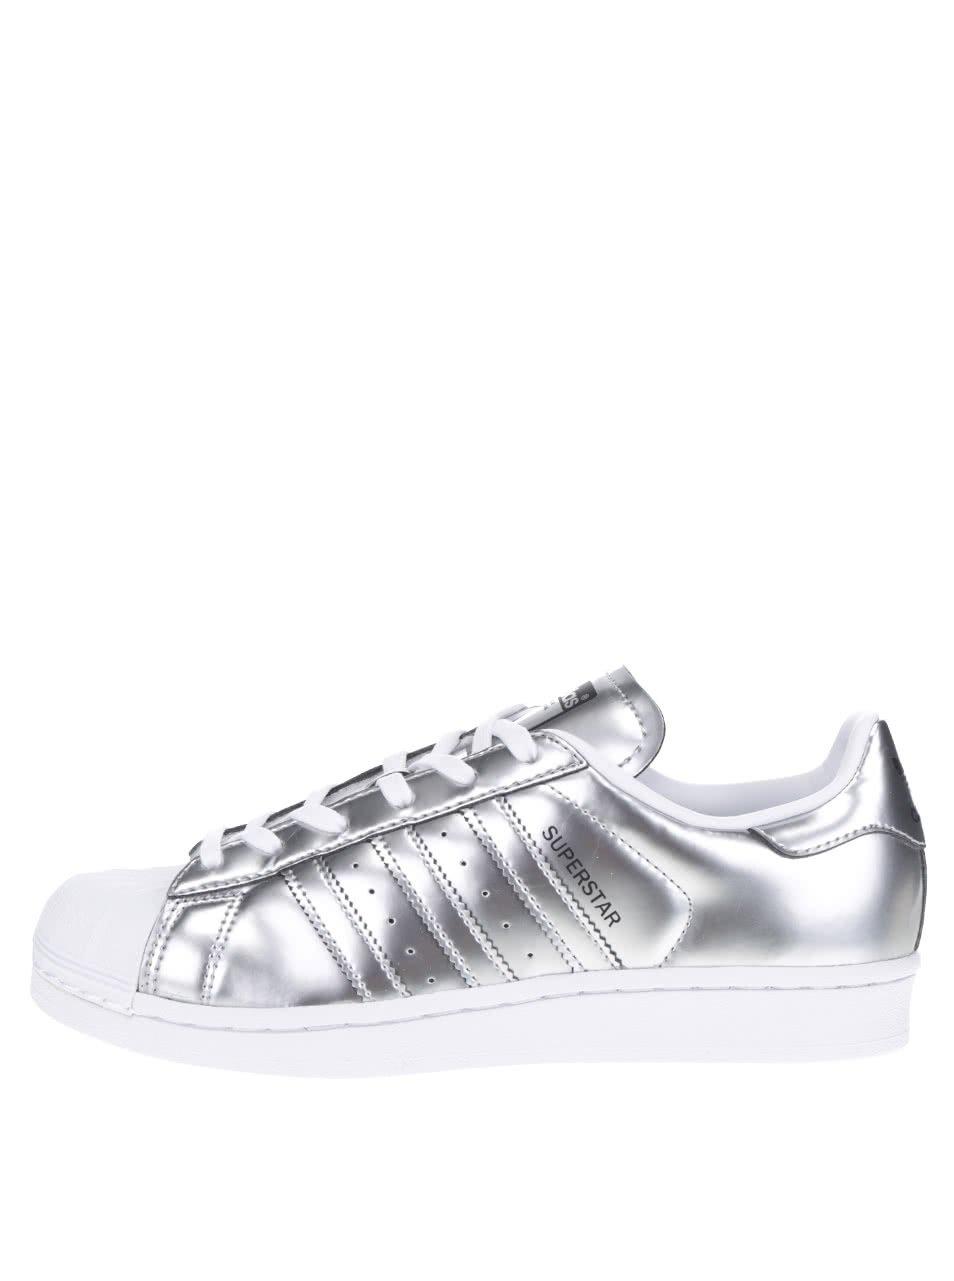 Dámské metalické tenisky v stříbrné barvě adidas Originals Superstar